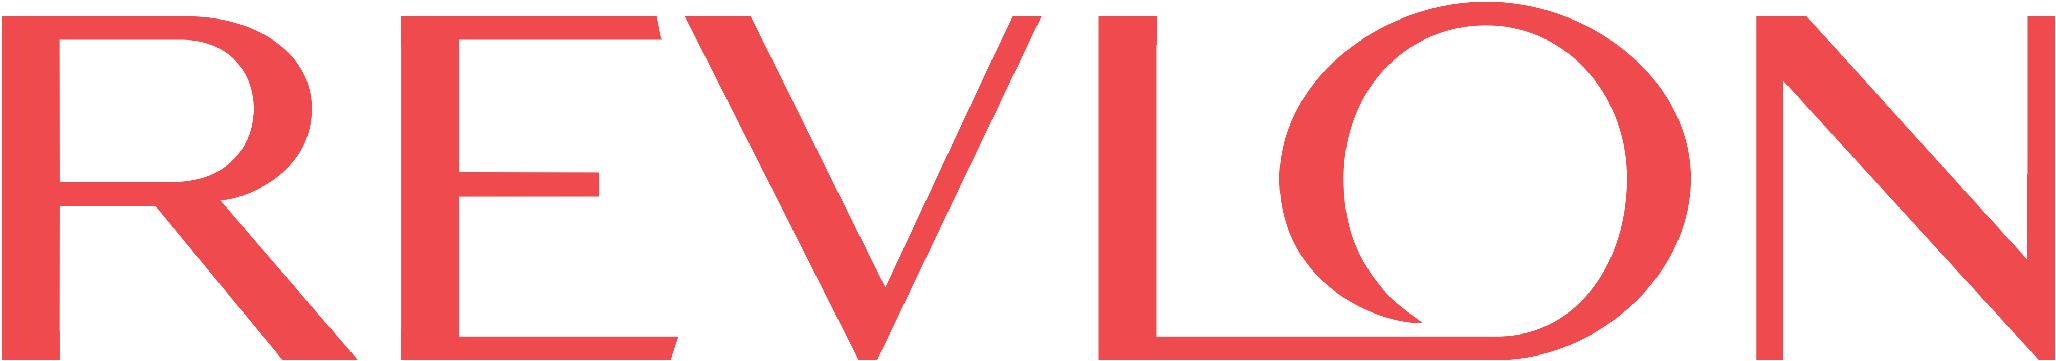 revlon-logo.png